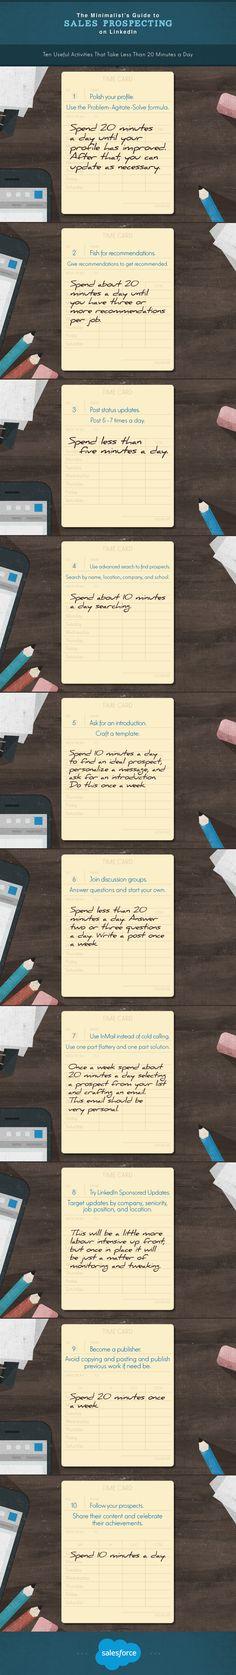 The Minimalist's Guide to Sales Prospecting on LinkedIn #infographic #LinkedIn #SocialMedia